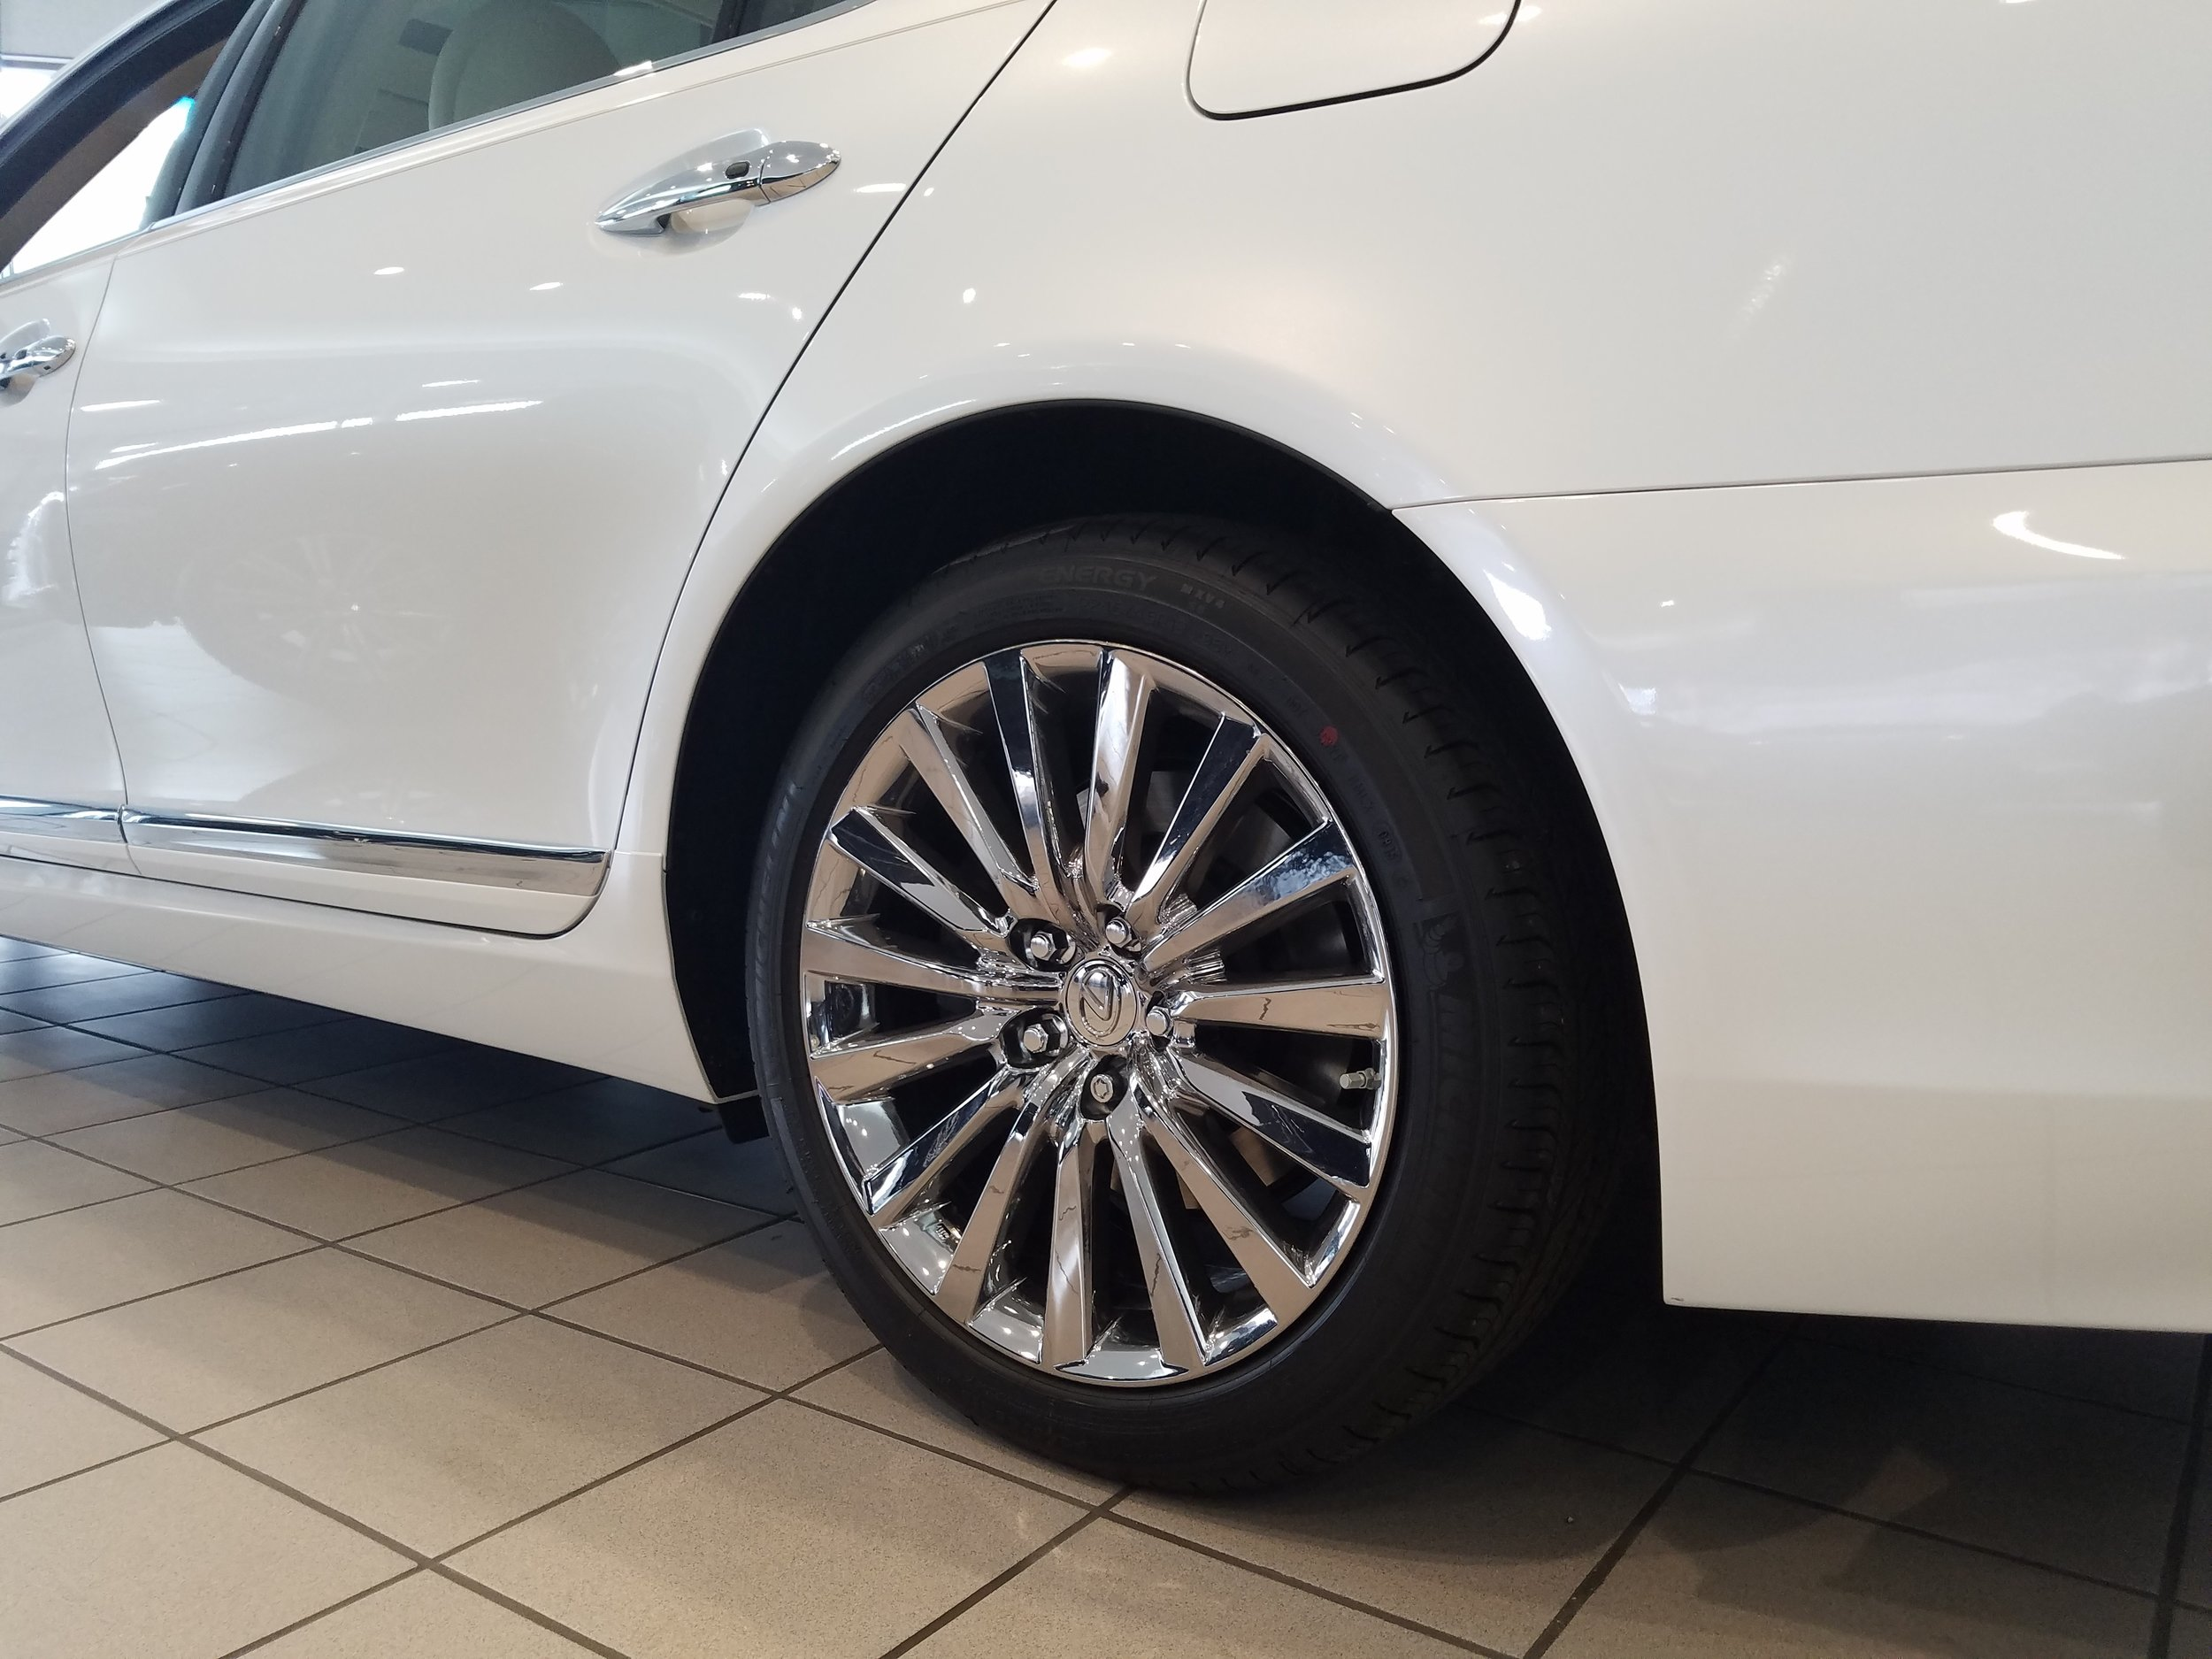 white-ls-460-bright-ice-wheels-2_30869596122_o.jpg